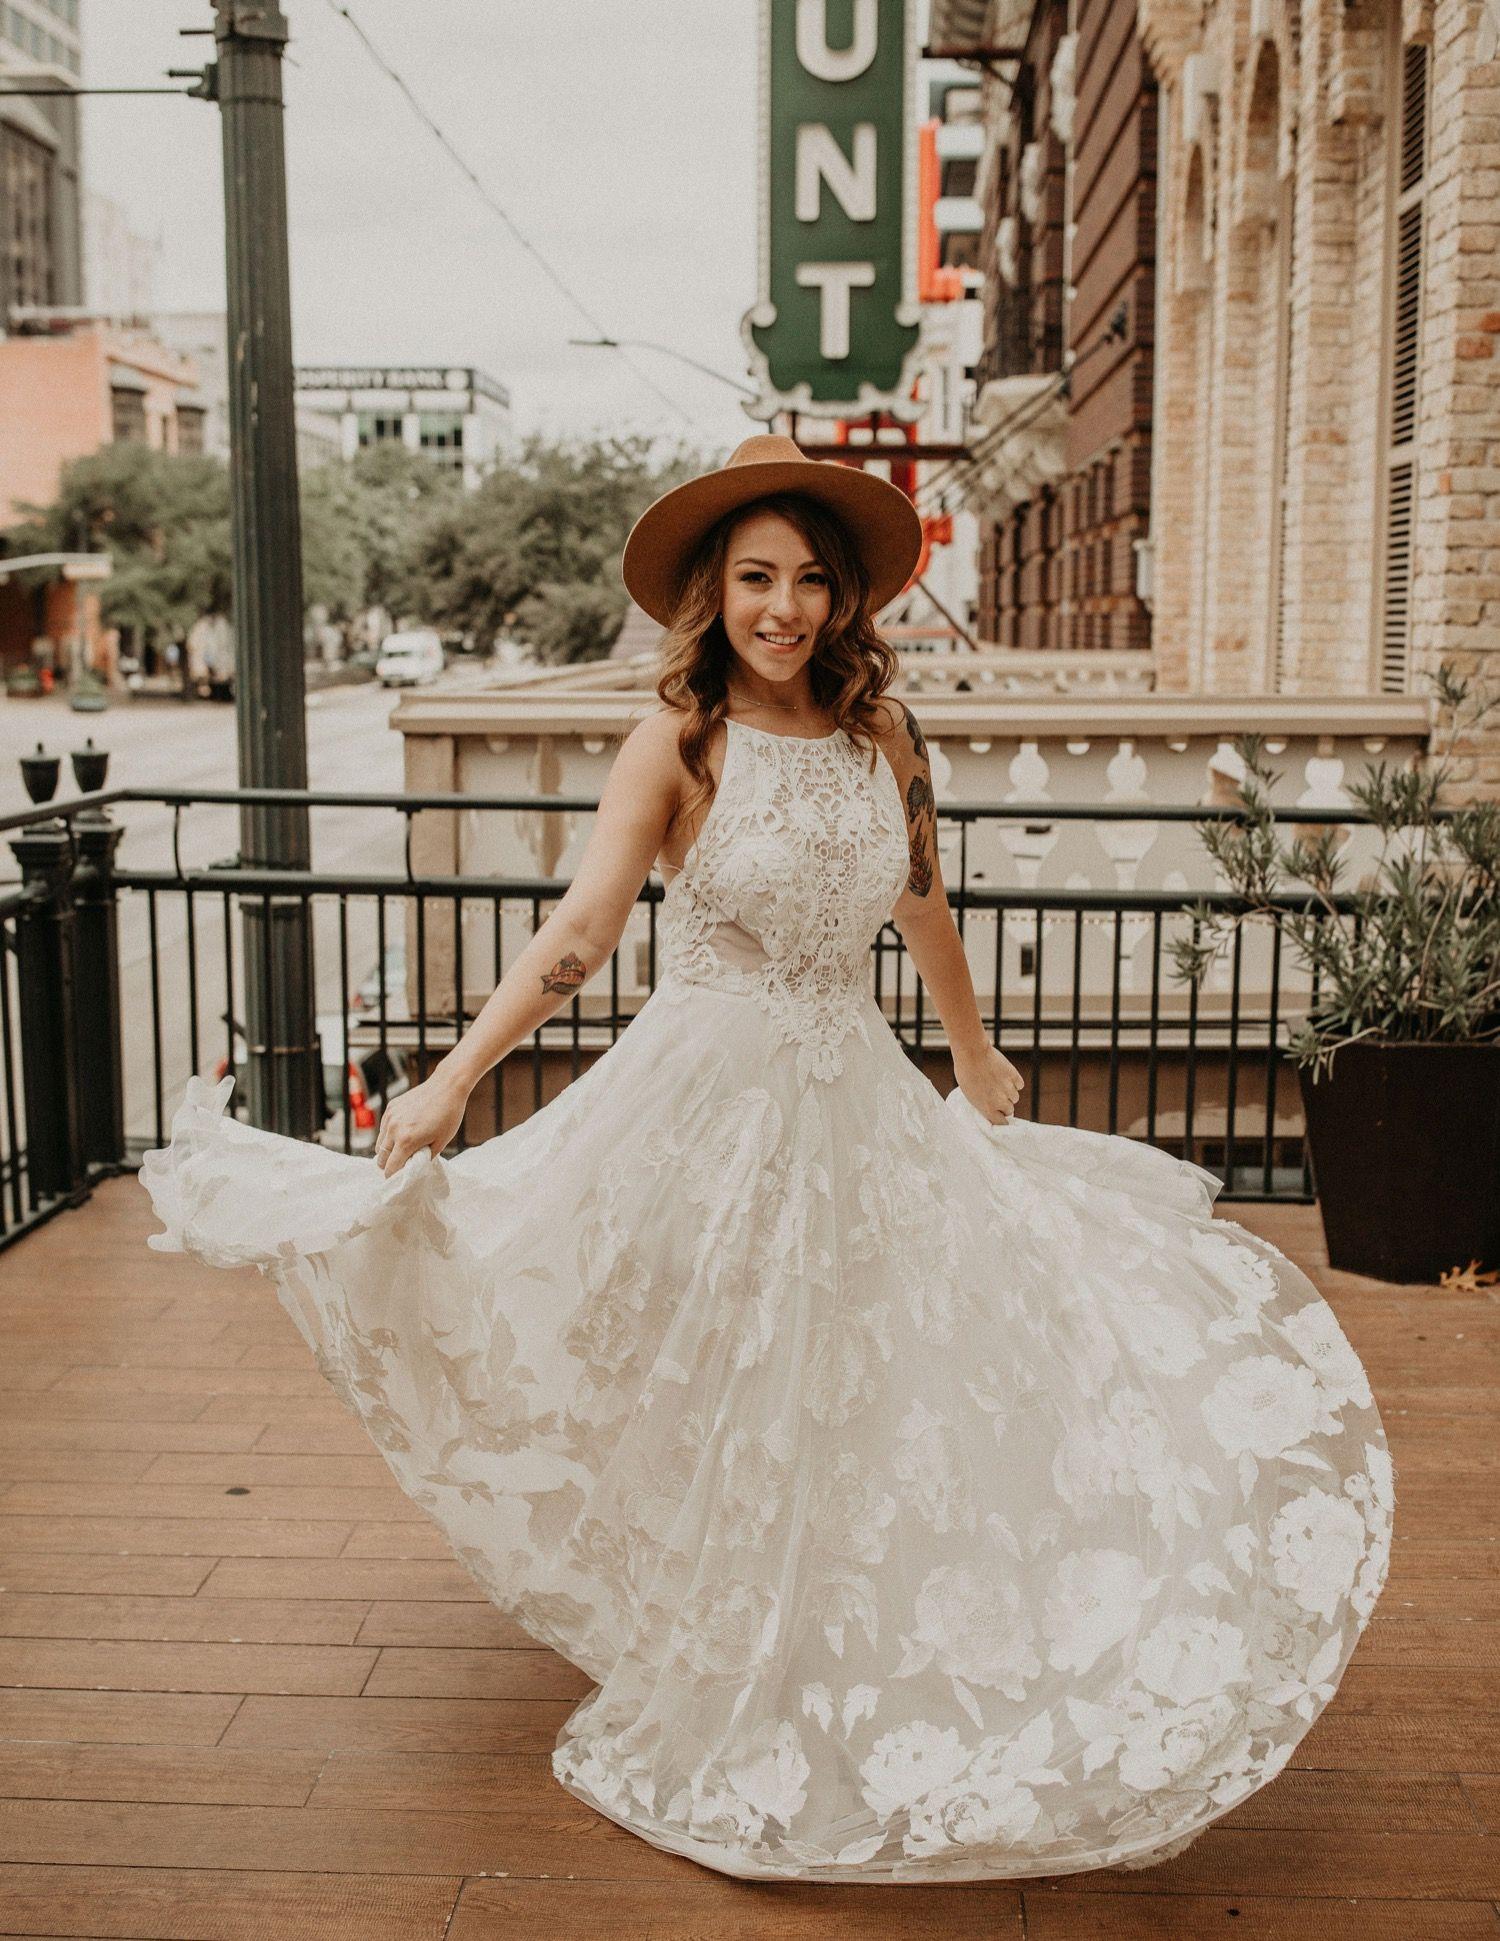 Boho Inspiration Shoot At Contemporary Austin Jones Center In Austin Tx Wedding Day Dresses Wedding Dress Inspiration